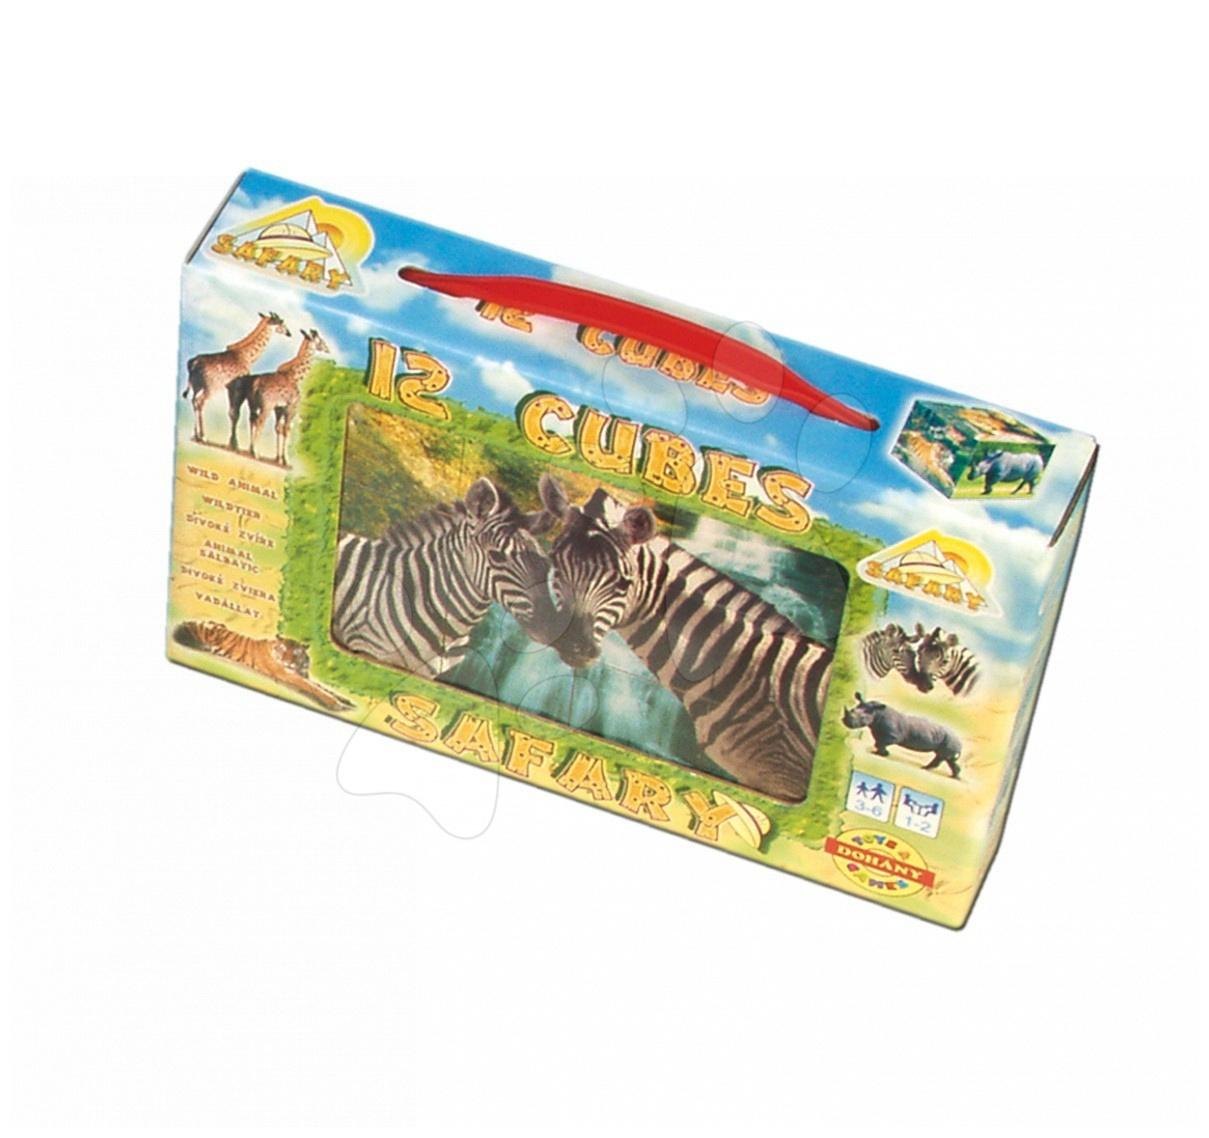 Pohádkové kostky Safari Dohány 12 dílů